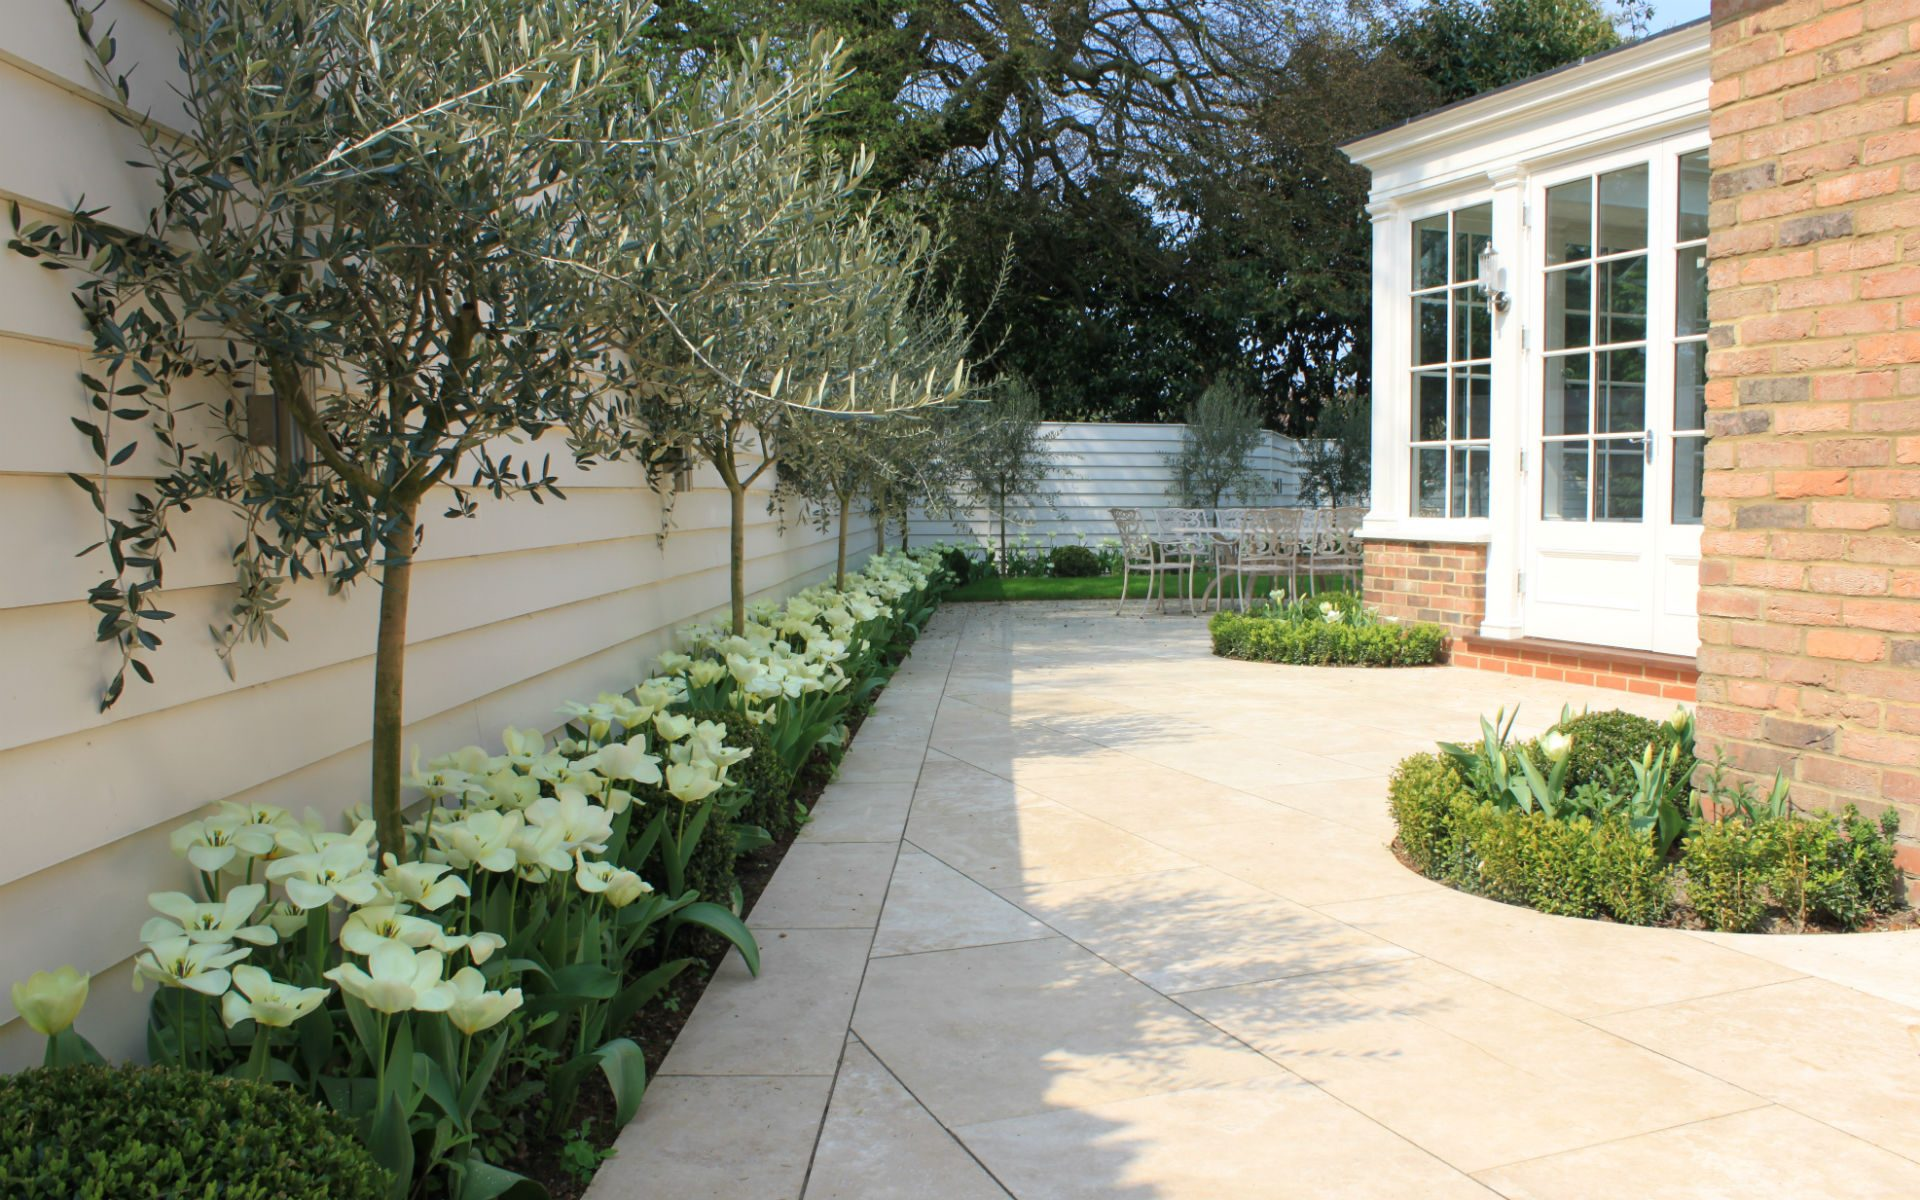 Portfolio Contemporary New England Garden Side Patio Olives Tulips White Closeboard Fencing